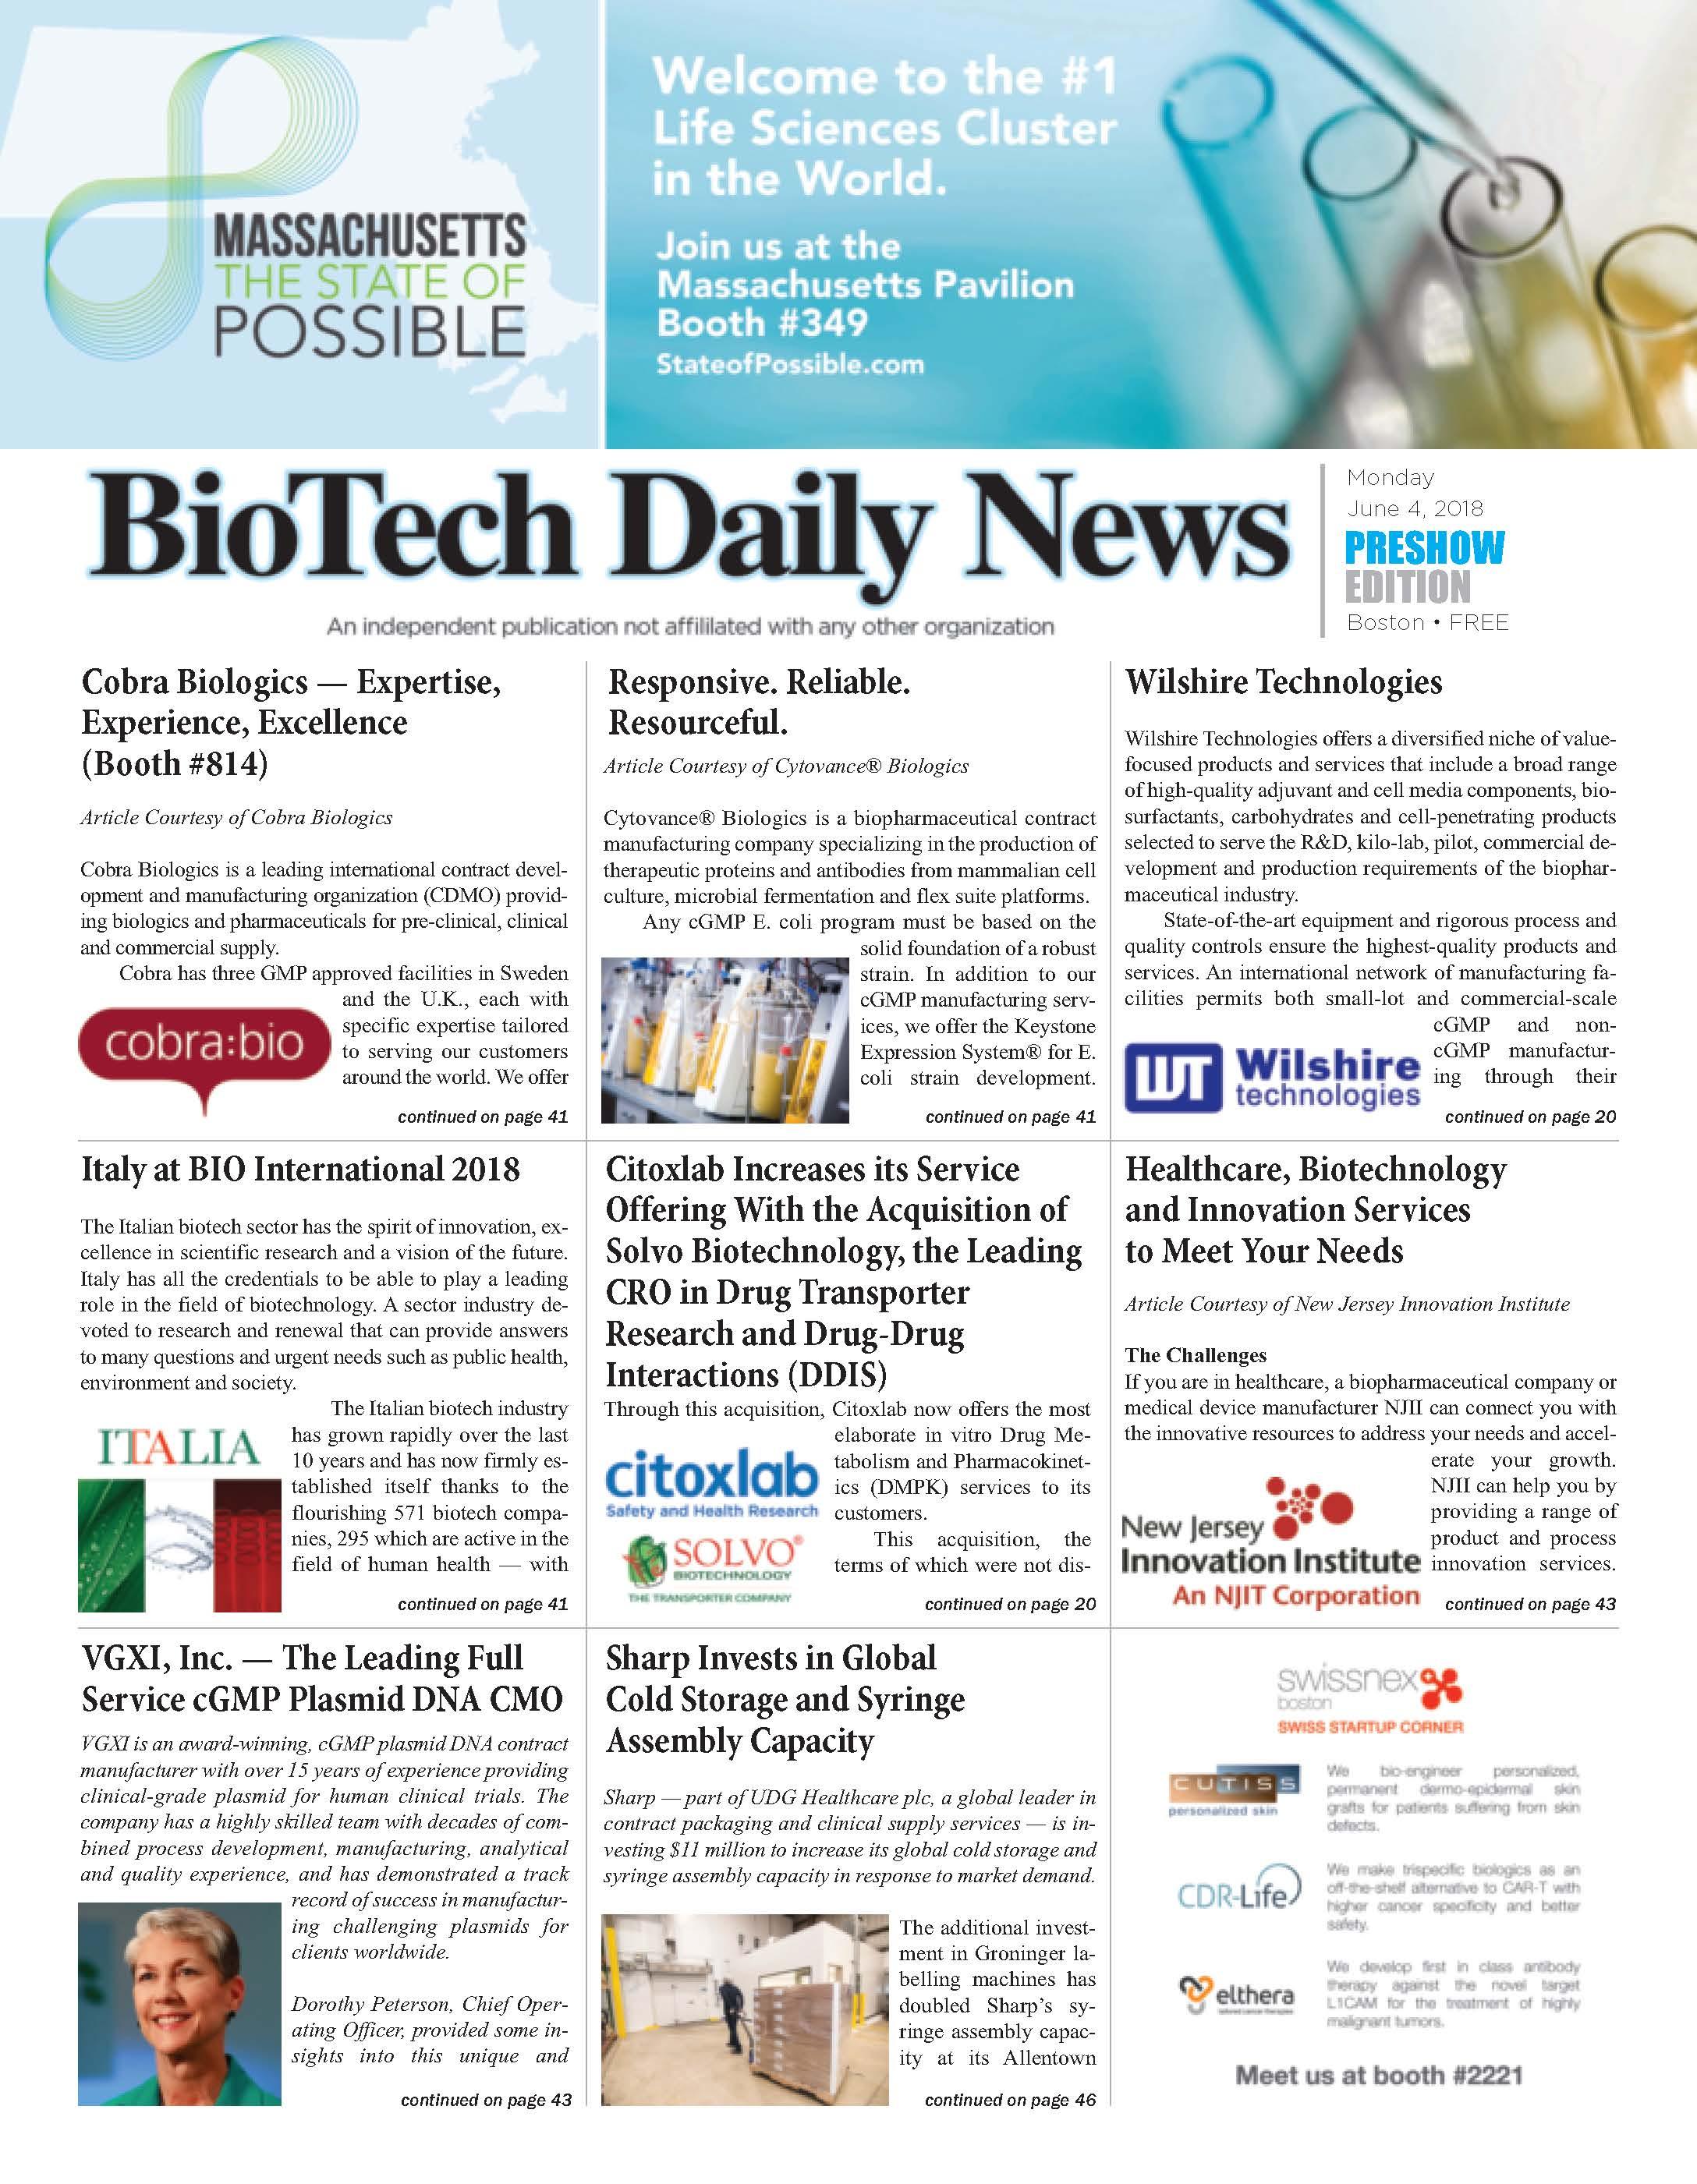 BioTech Daily news